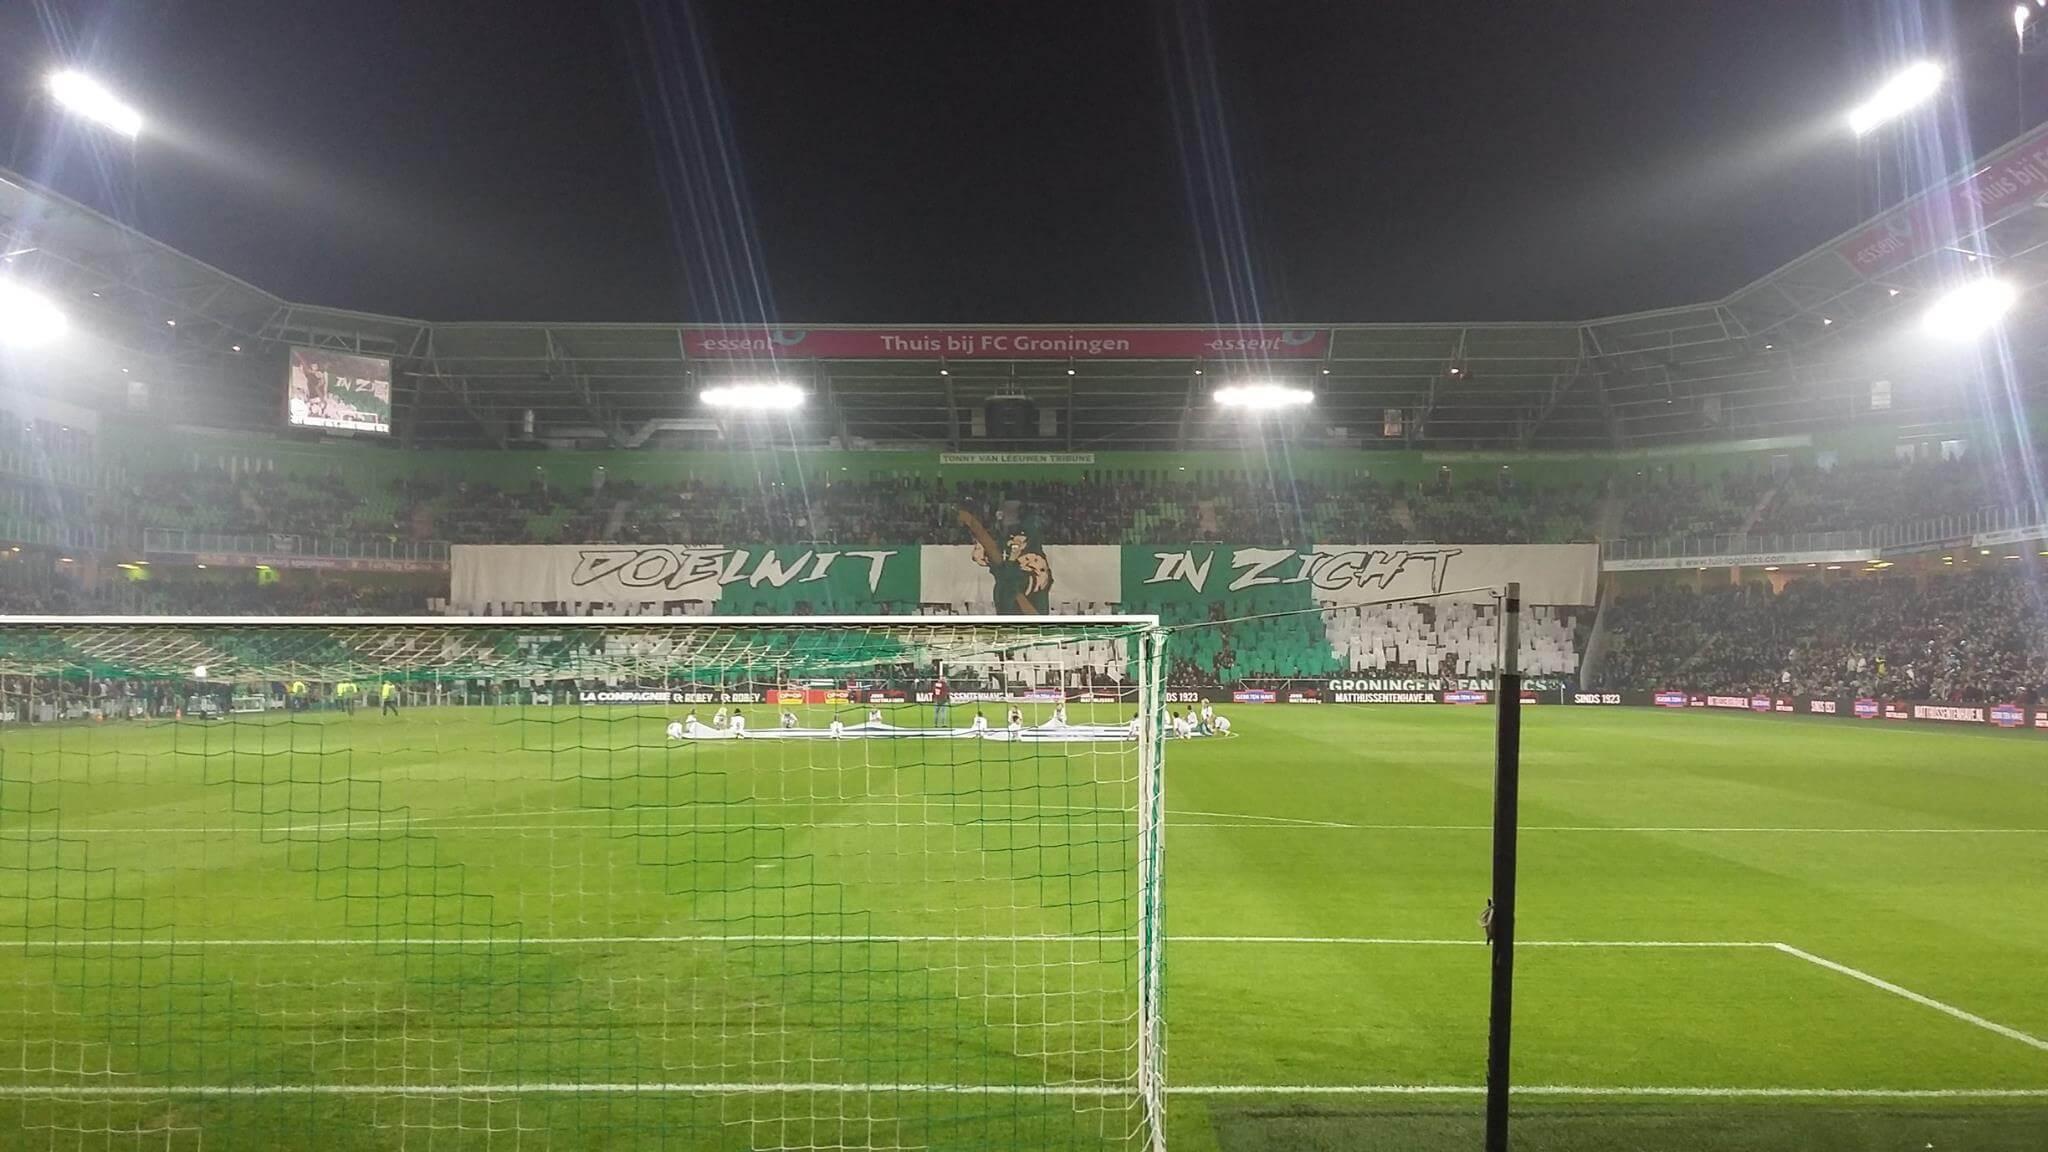 Groningen: Noordlease Stadion